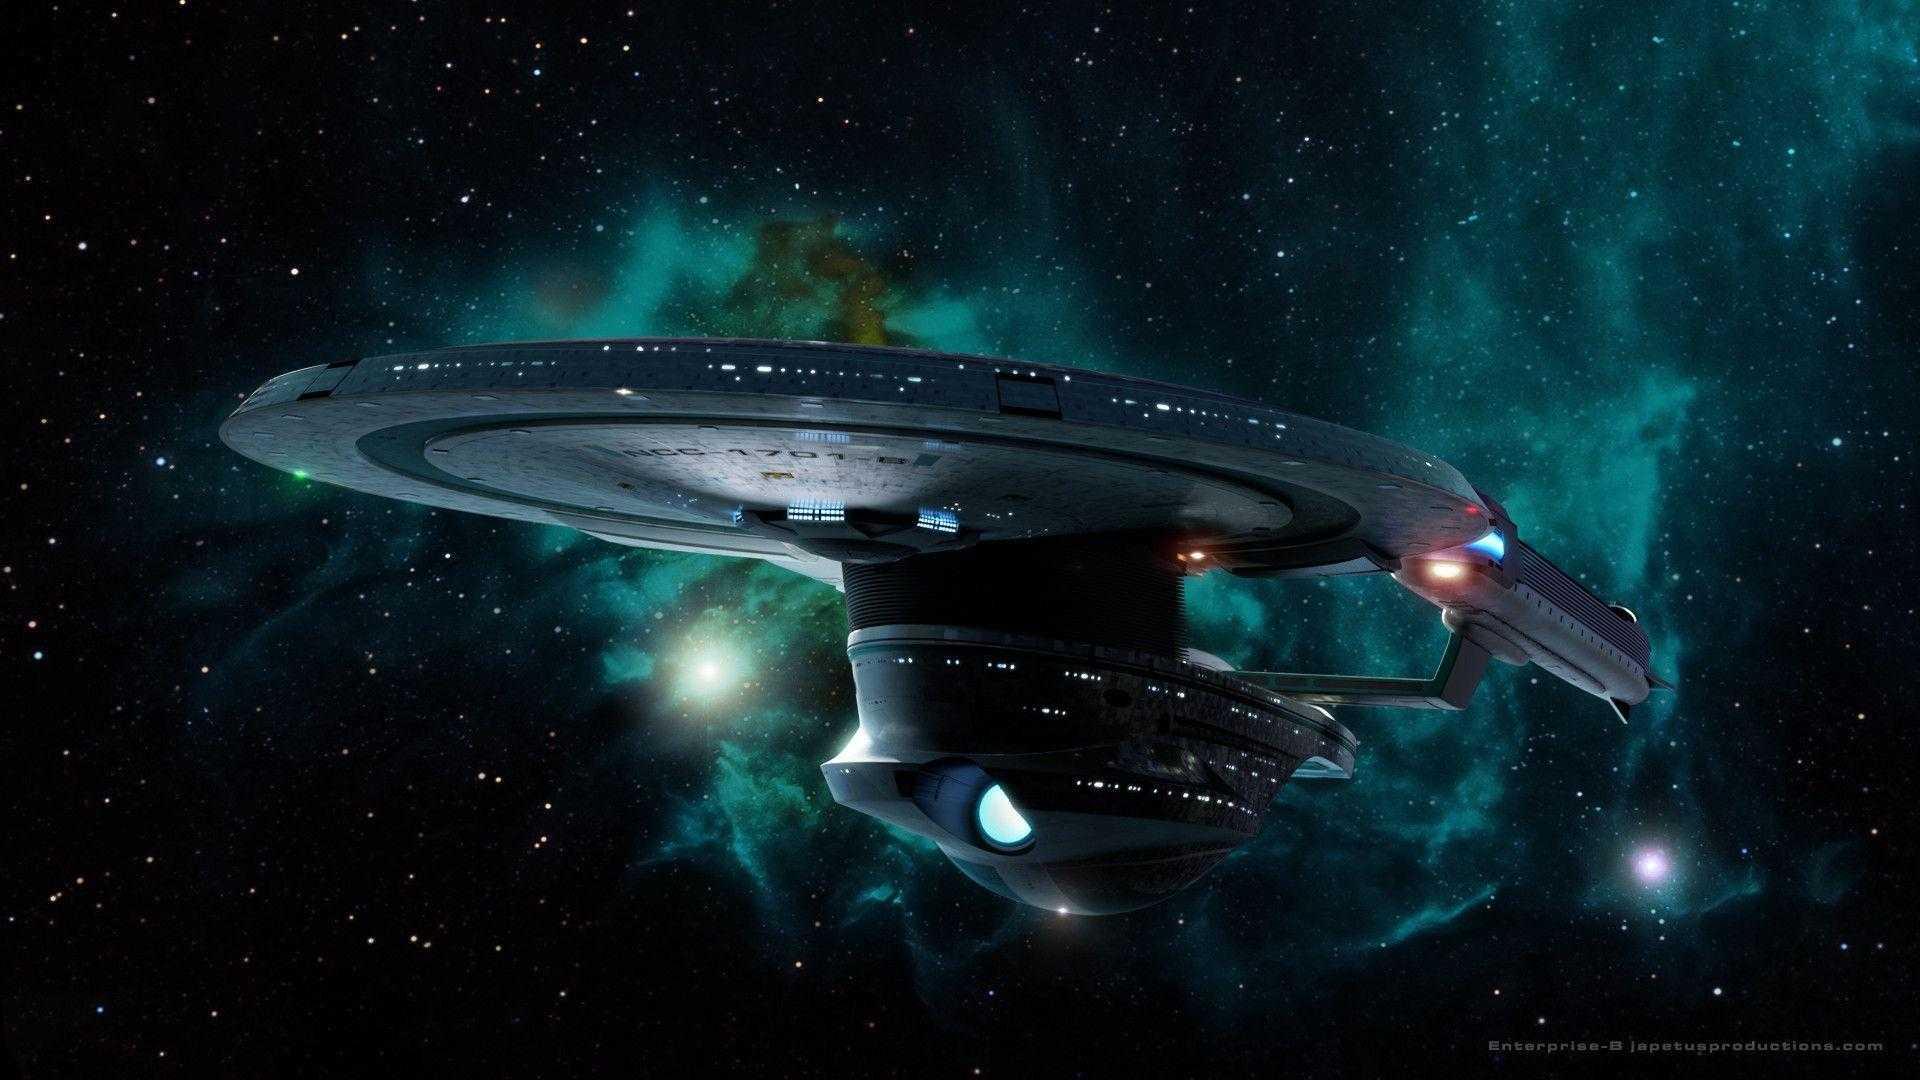 Star Trek Wallpapers Top Free Star Trek Backgrounds Wallpaperaccess